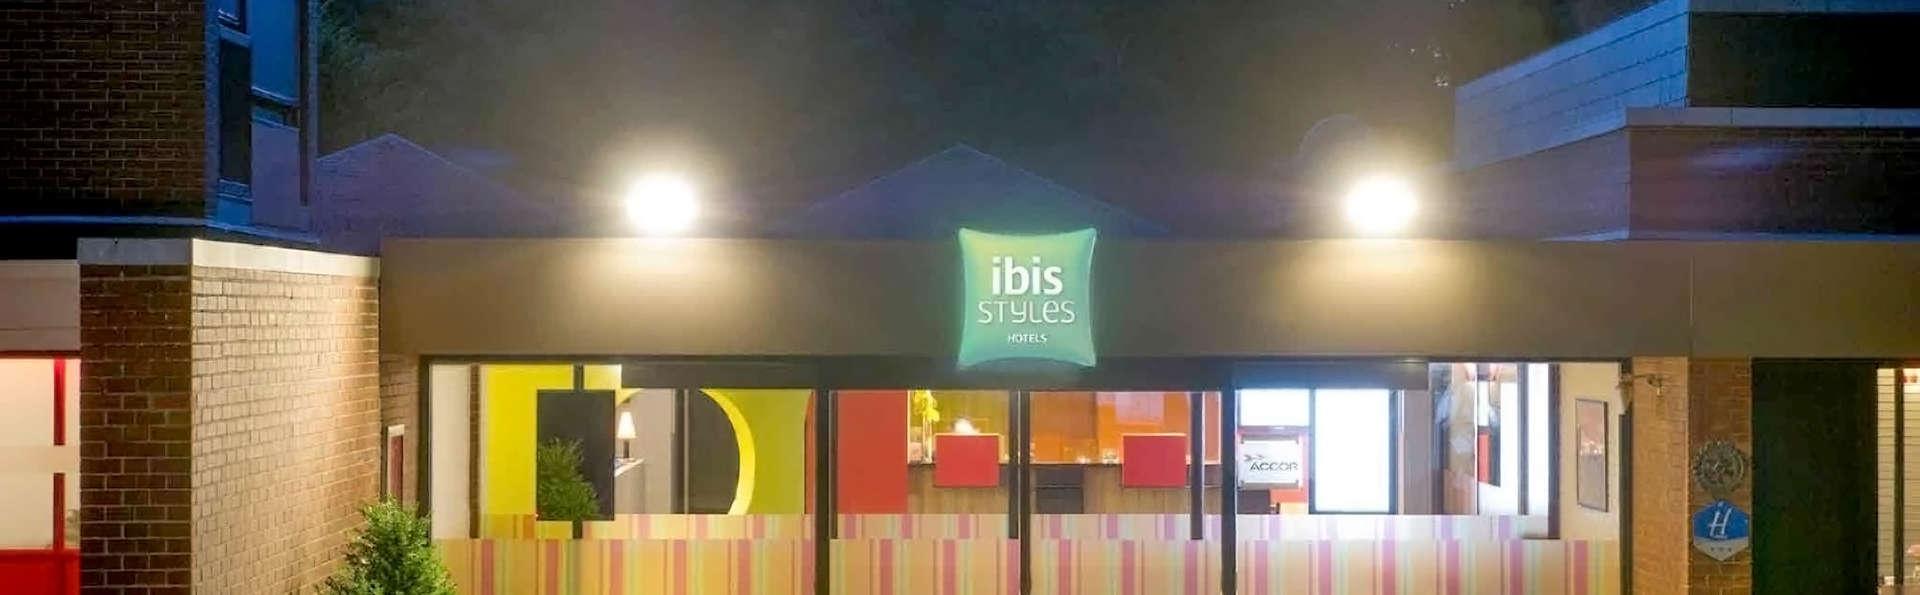 ibis Styles Louvain-la-Neuve - Edit_Front.jpg